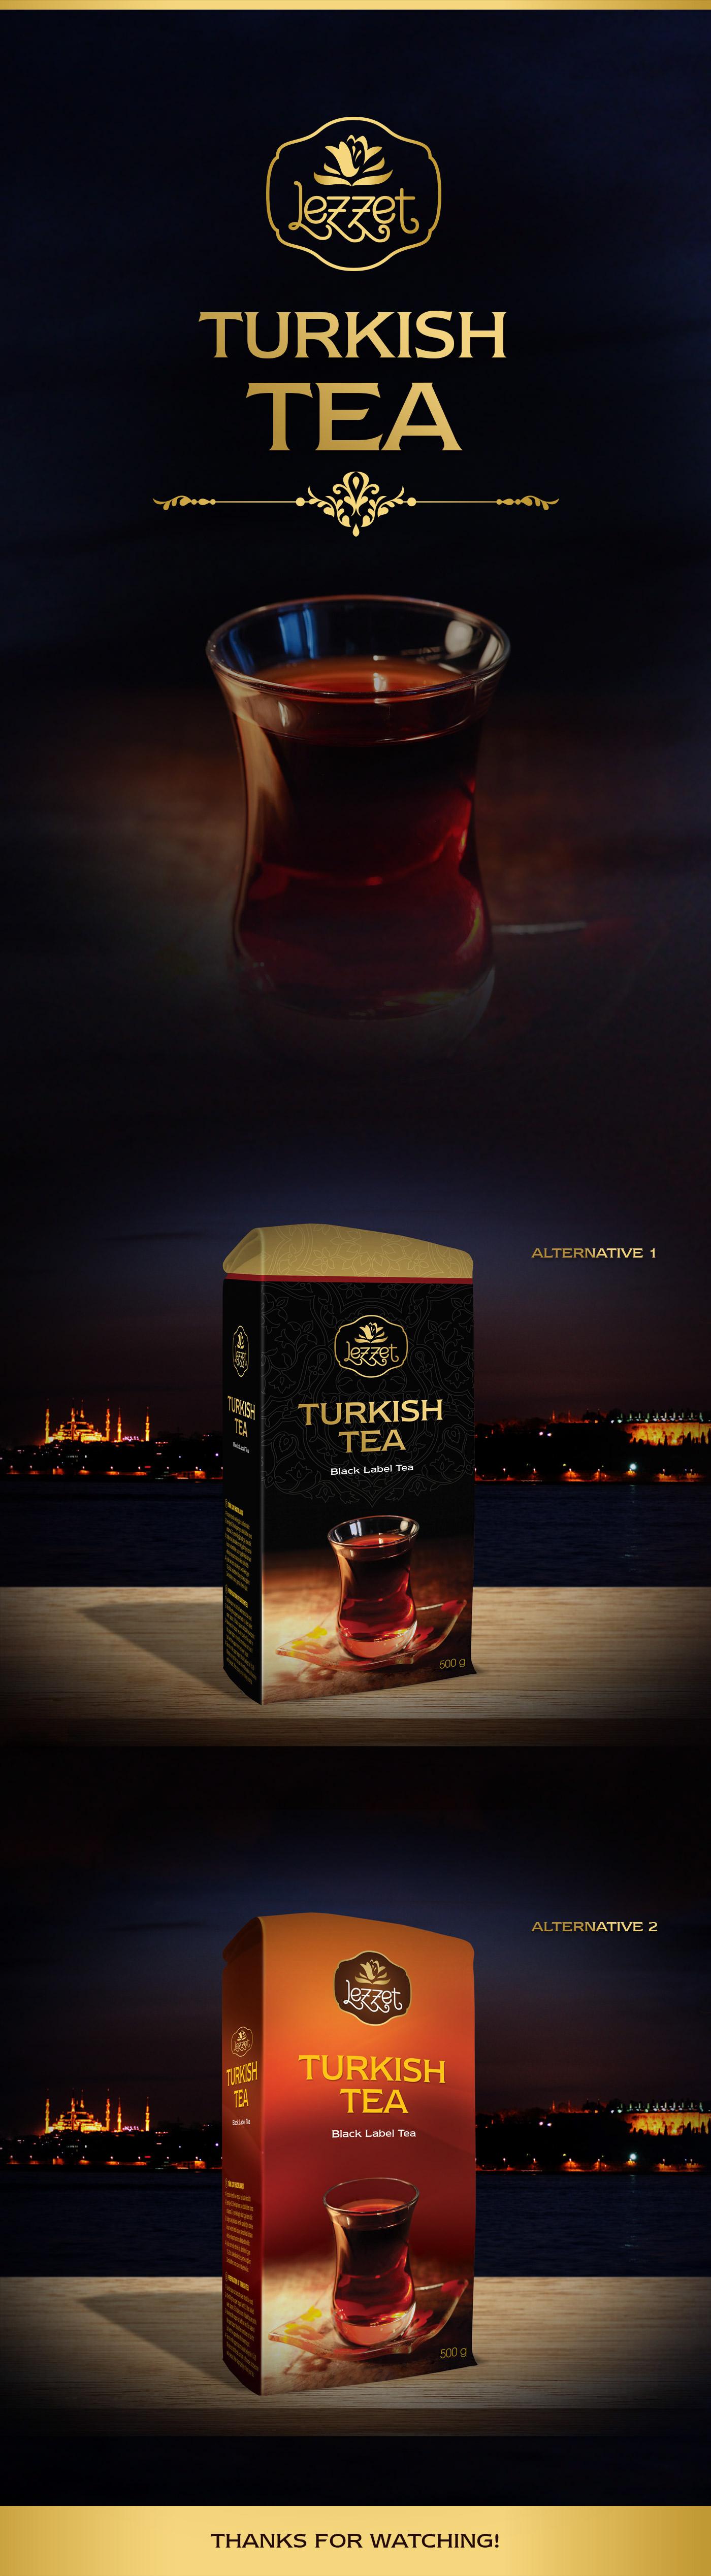 ambalaj packing tea çay istanbul tukish tea Packing Design lezzet drink ottoman osmanlı coffe kahve sohbet